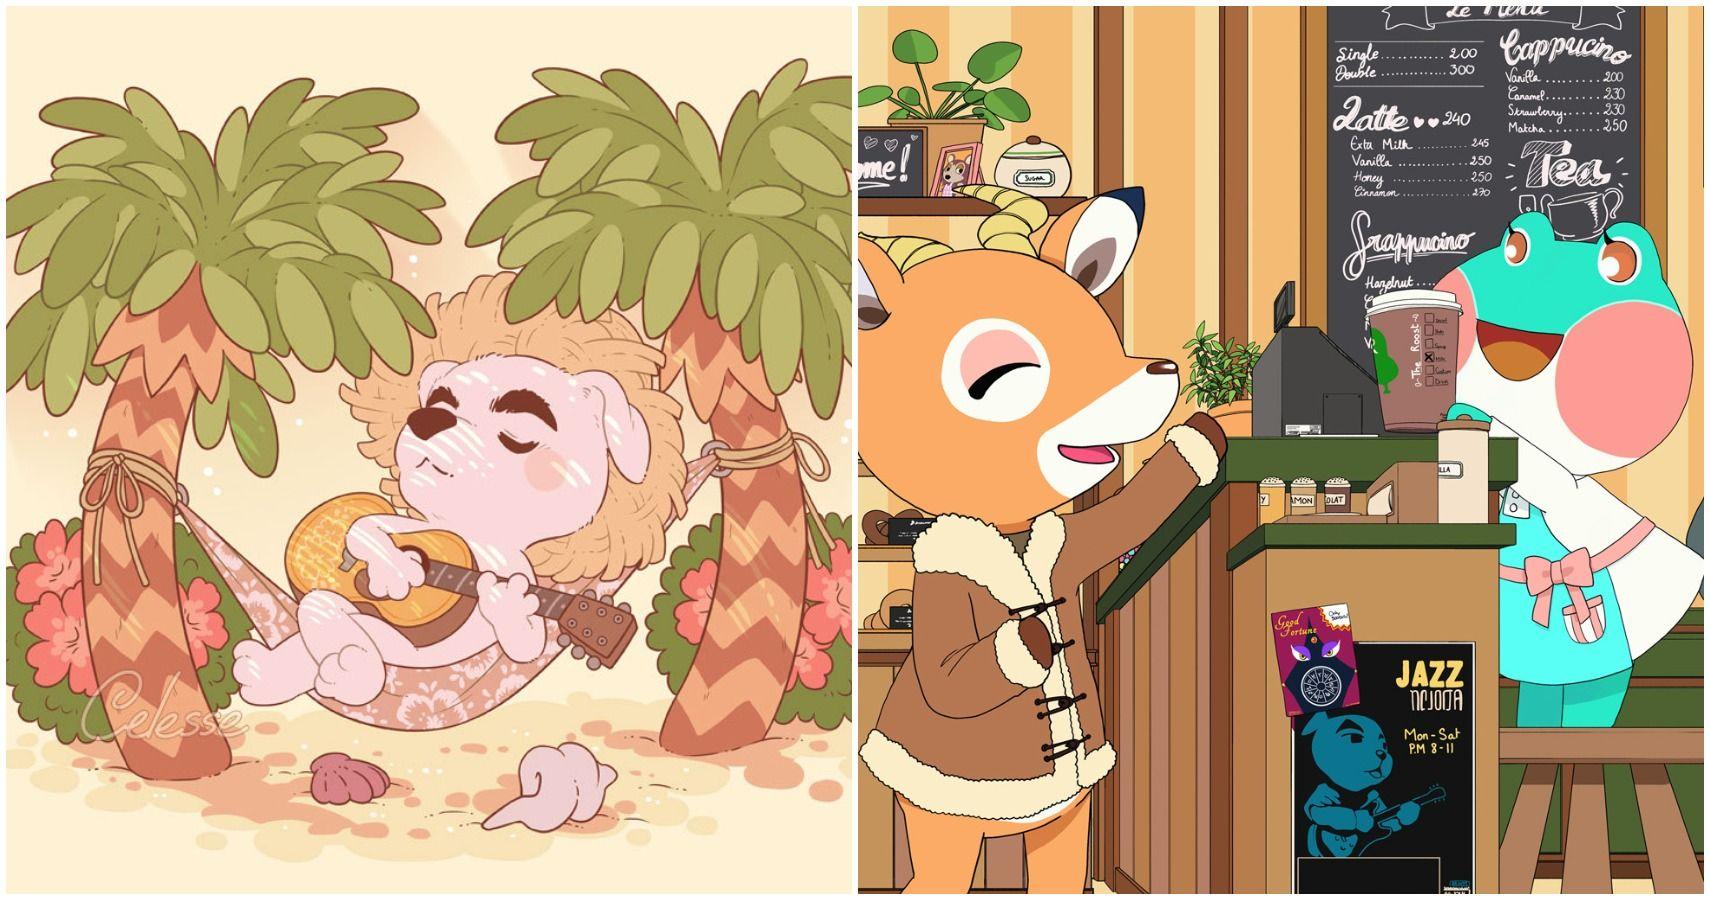 Animal Crossing Fan Art - Animal Crossing Fan Art